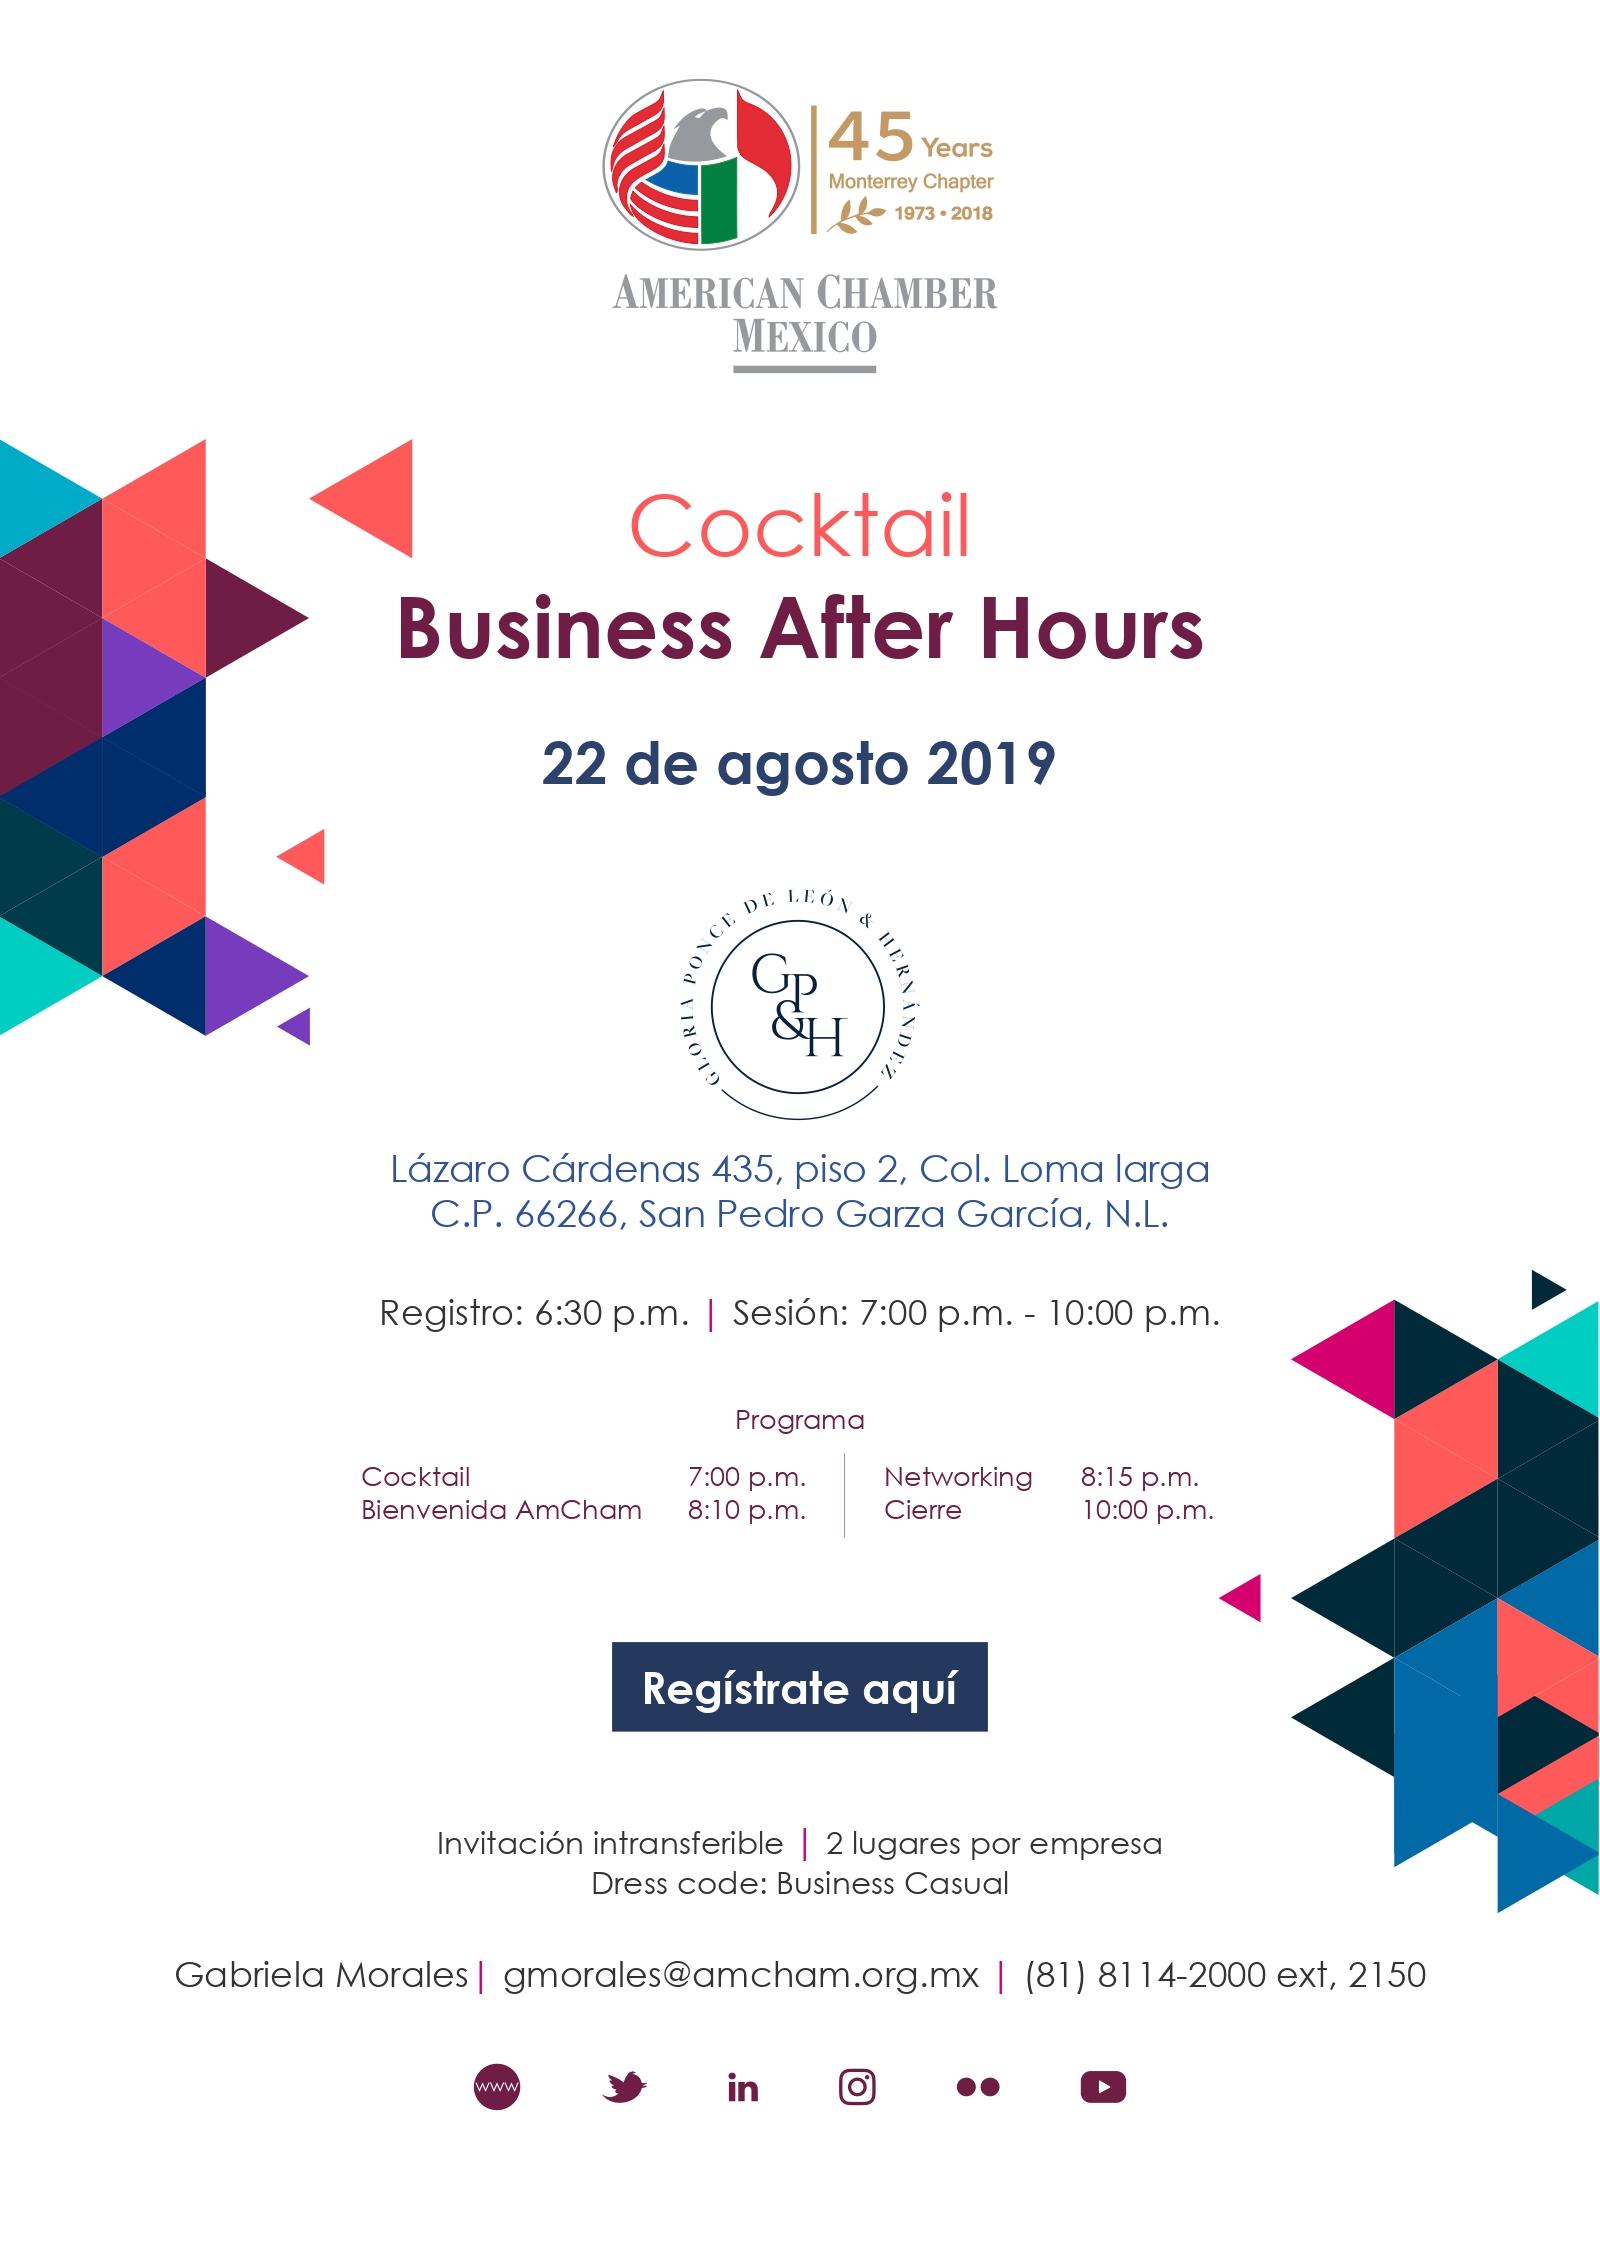 MTY Cocktail Business After Hours patrocinador por Gloria Ponce de León & Hernández